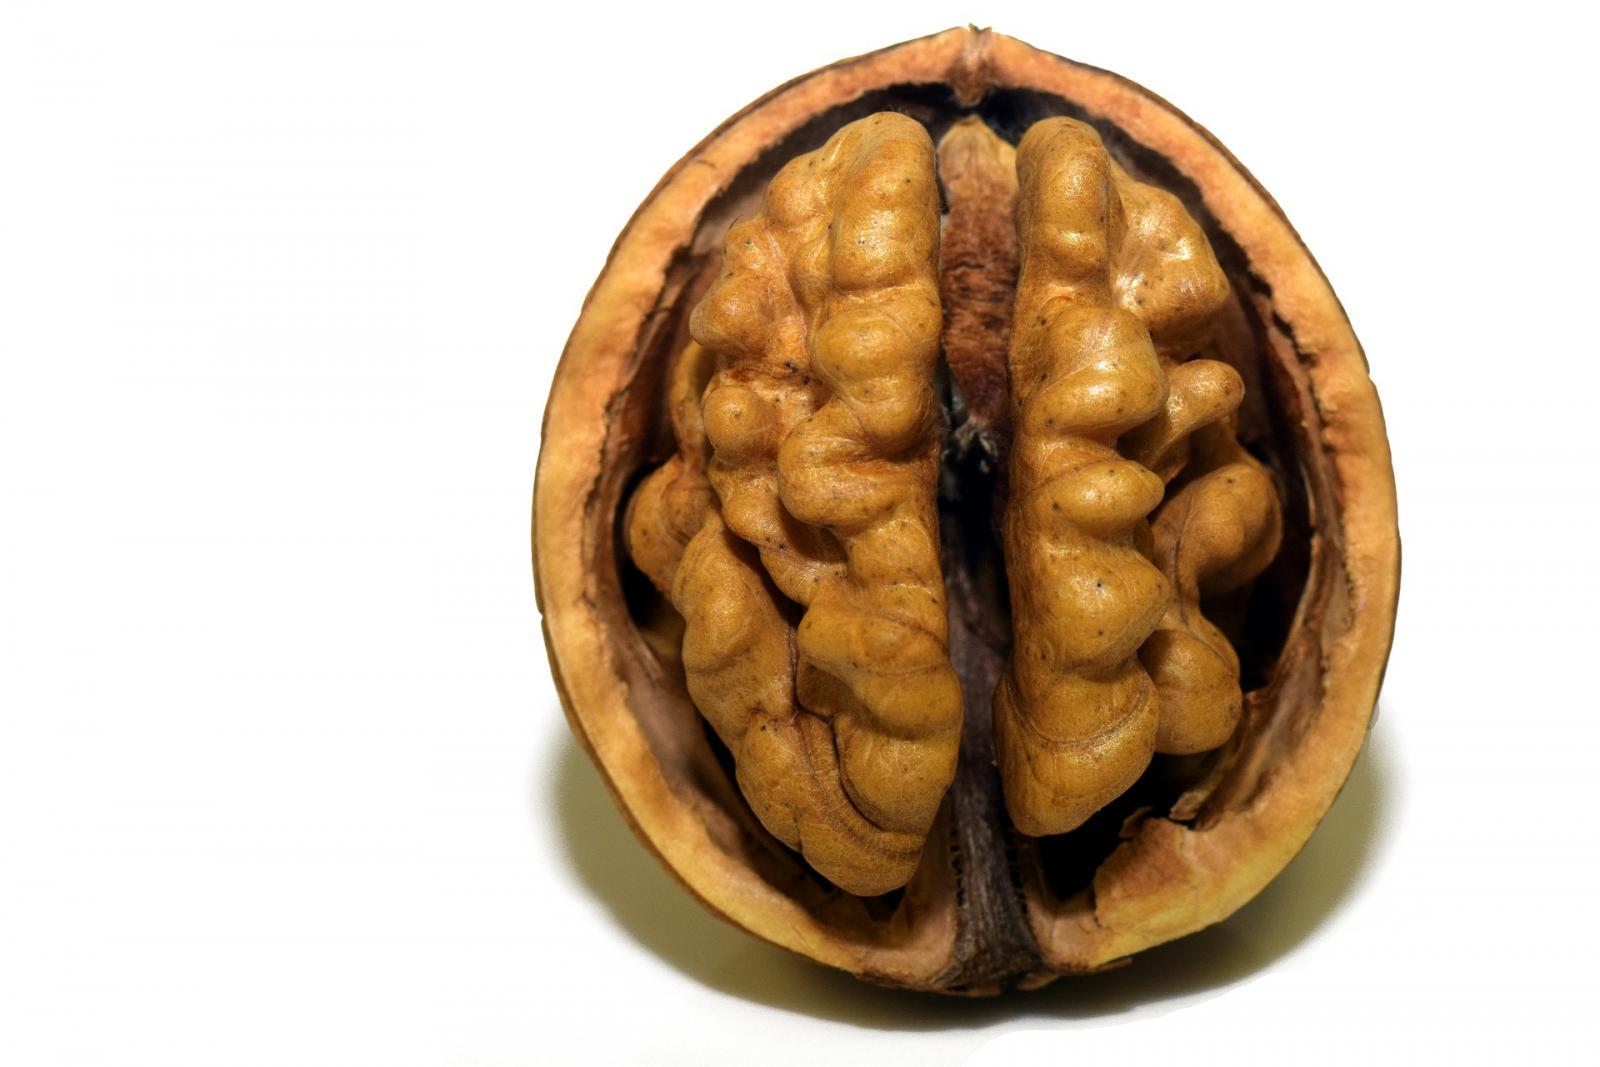 Walnut. Photo credit: Pixabay